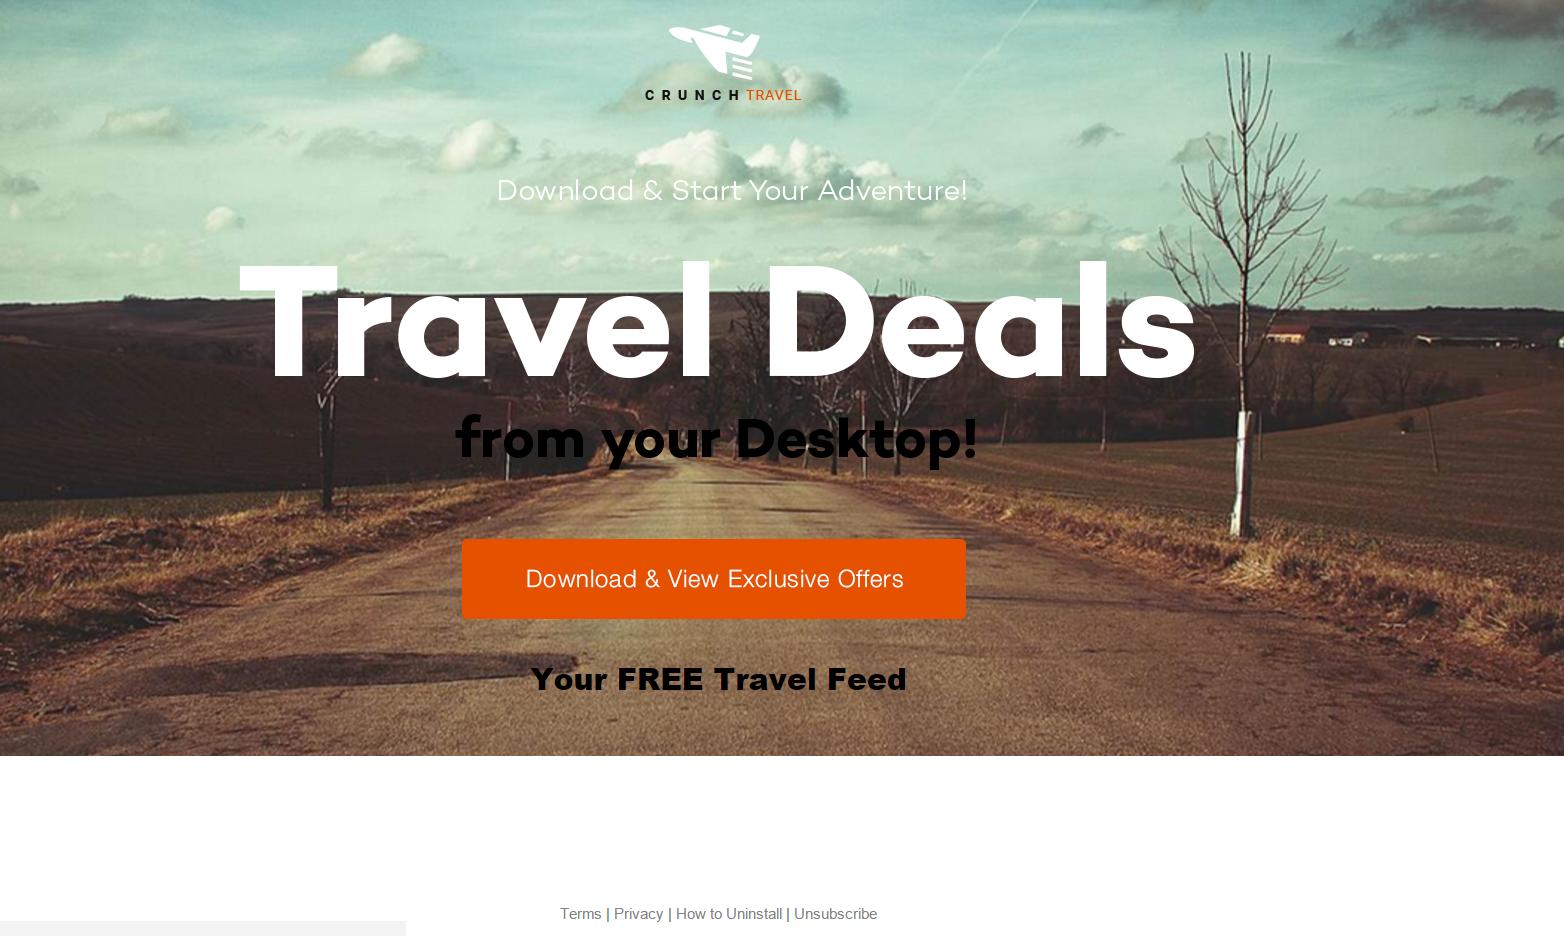 ads by Crunch Travel